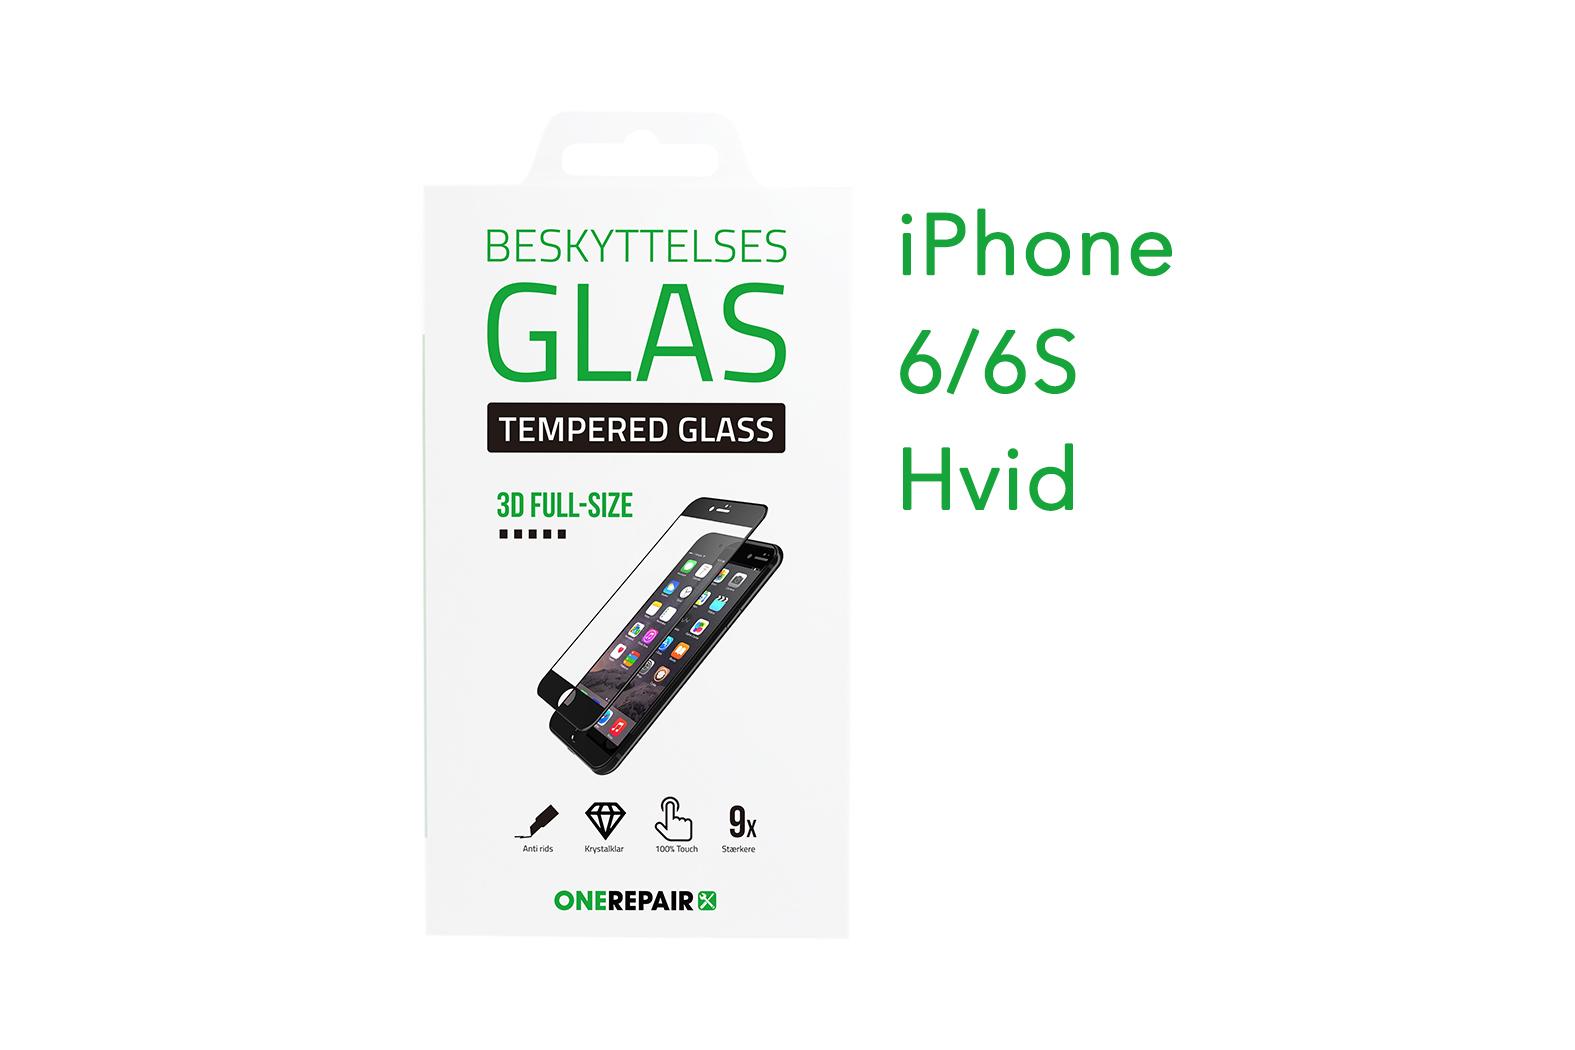 beskyttelsesglas, beskyttelse, glas, iPhone 6, 6S Apple, Fullsize, Full, Size, Pazer, Panser, Hvid, staerk, stærk, Godt, Billig, 3d